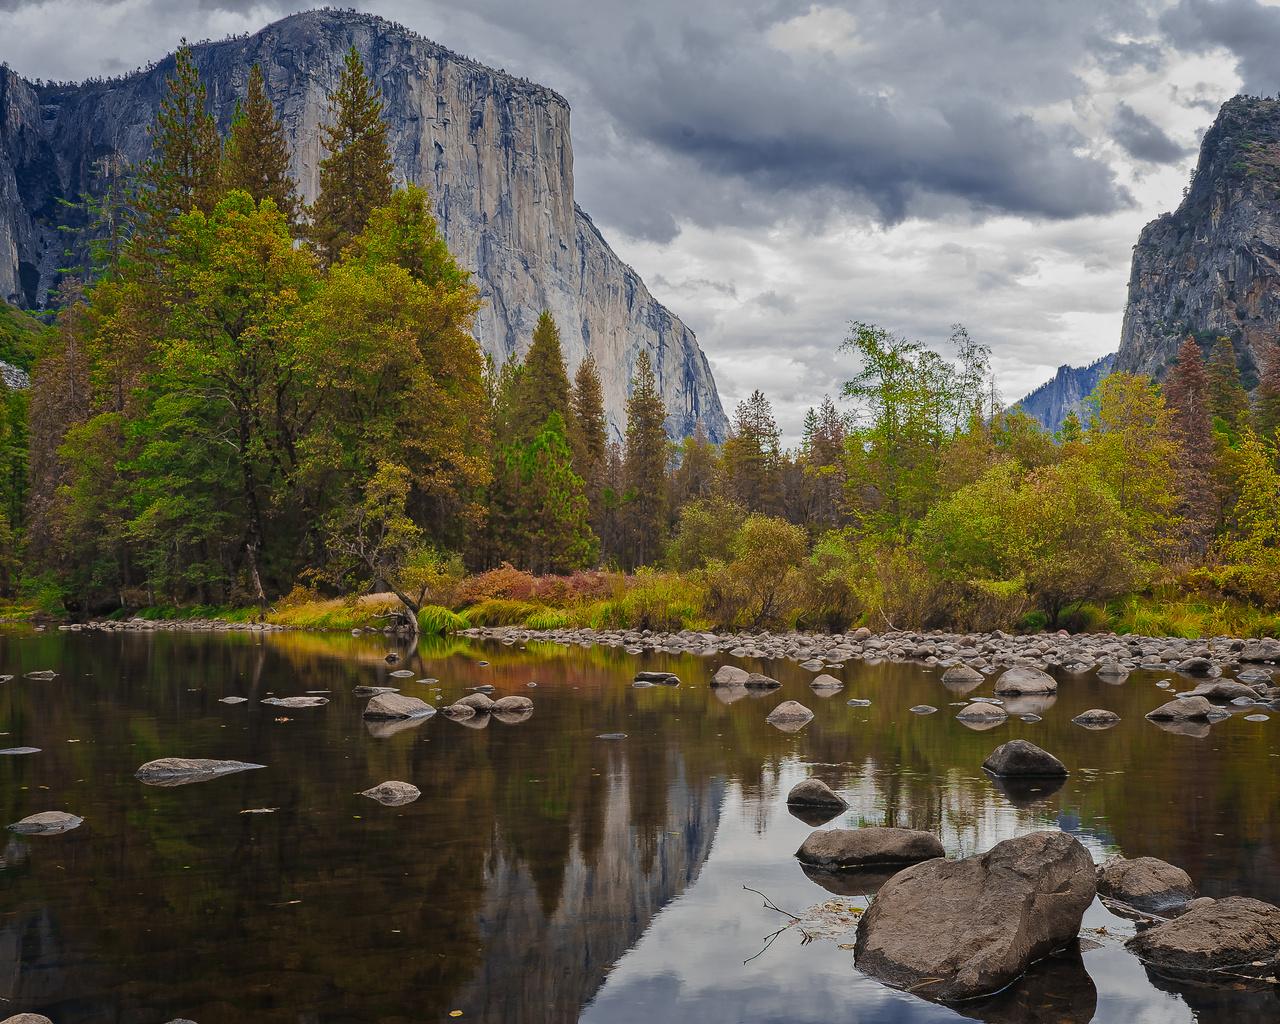 yosemite, national park, sierra nevada, горы, озеро, лес, деревья, скалы, осень